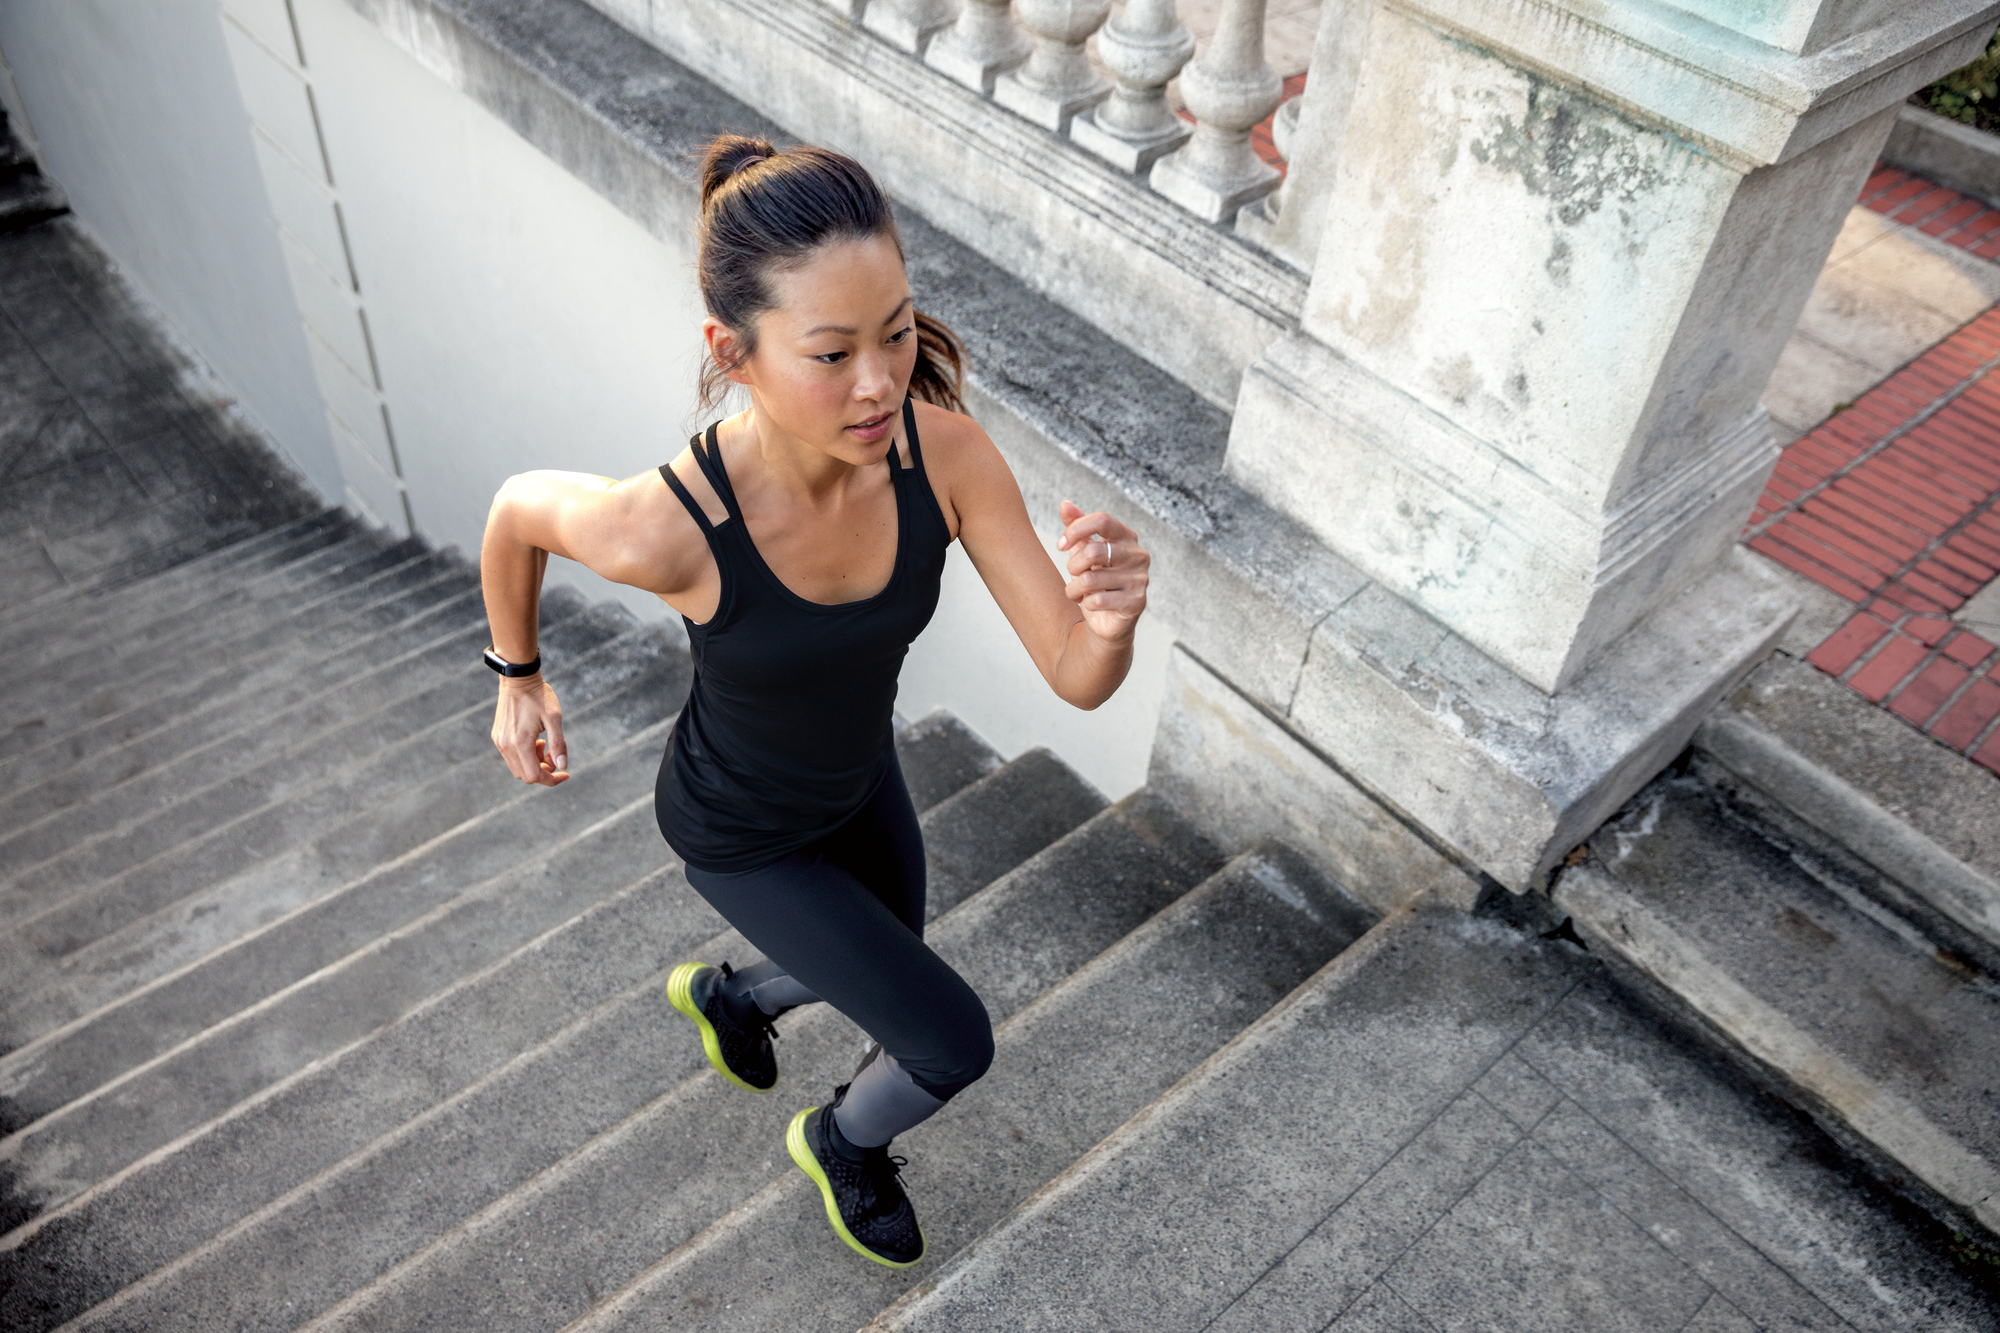 Runner wearing Fitbit Alta HR fitness tracker.